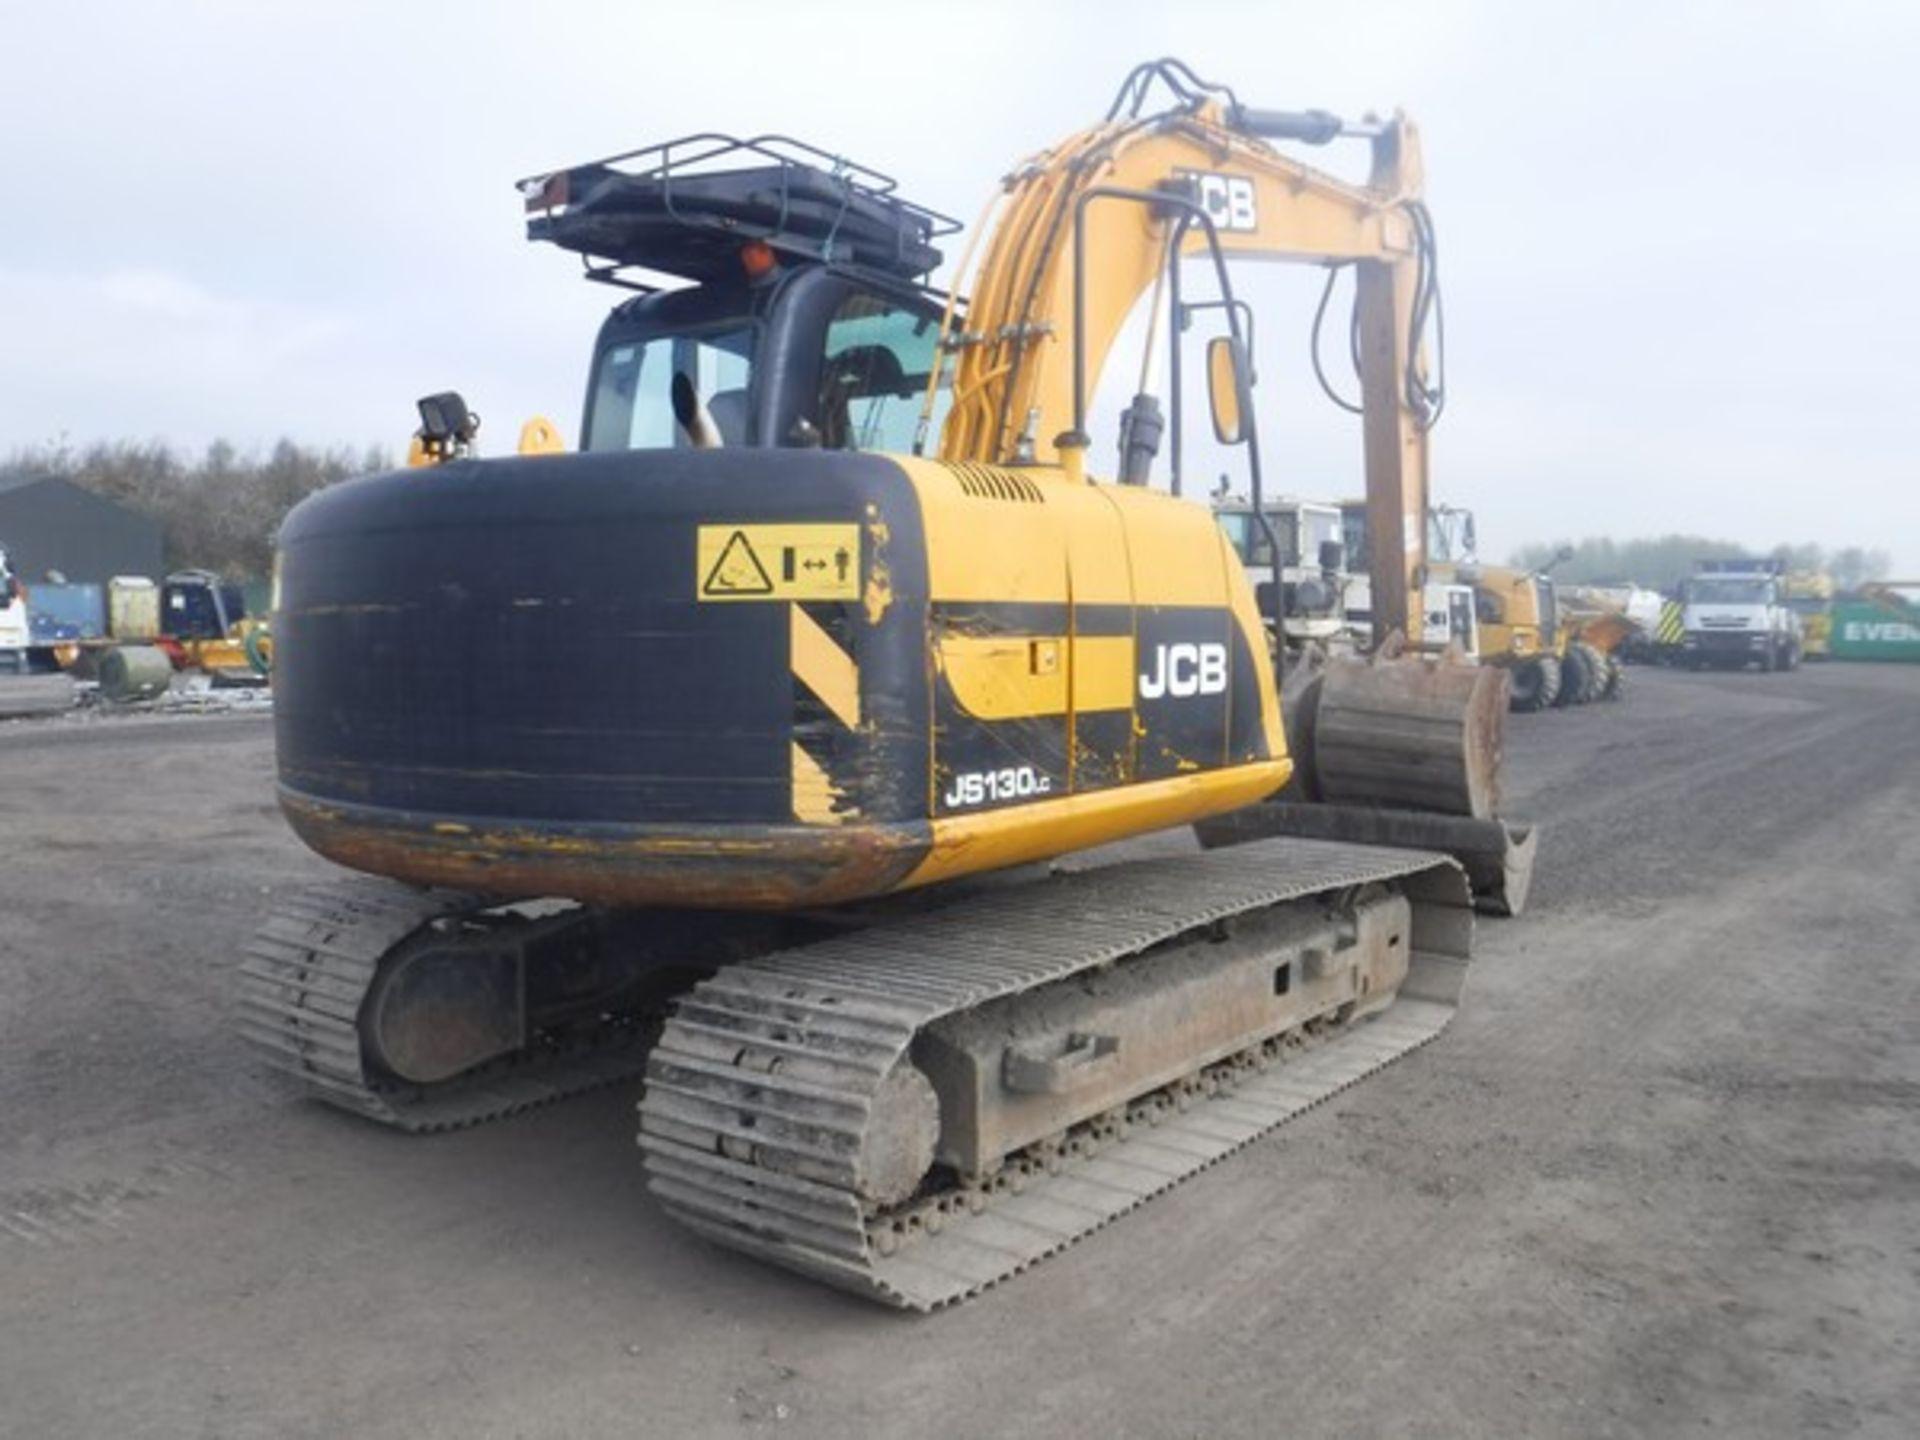 Auktionslos 824 - 2001 JCB JS130 hydraulic excavator 5134hrs (not verified). Lift capacity 13147 kg. Fully